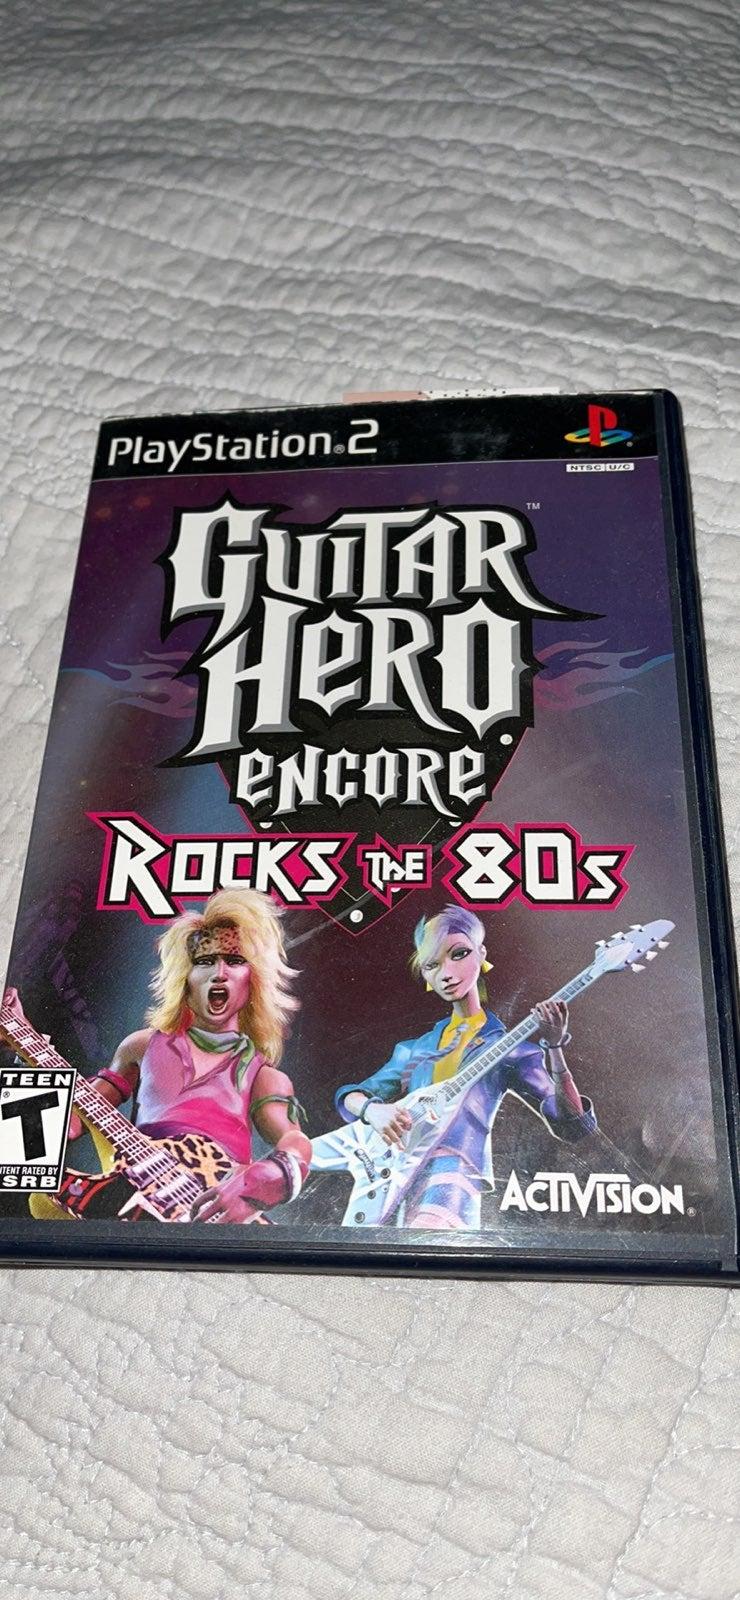 Guitar Hero Encore: Rocks the 80s on Pla